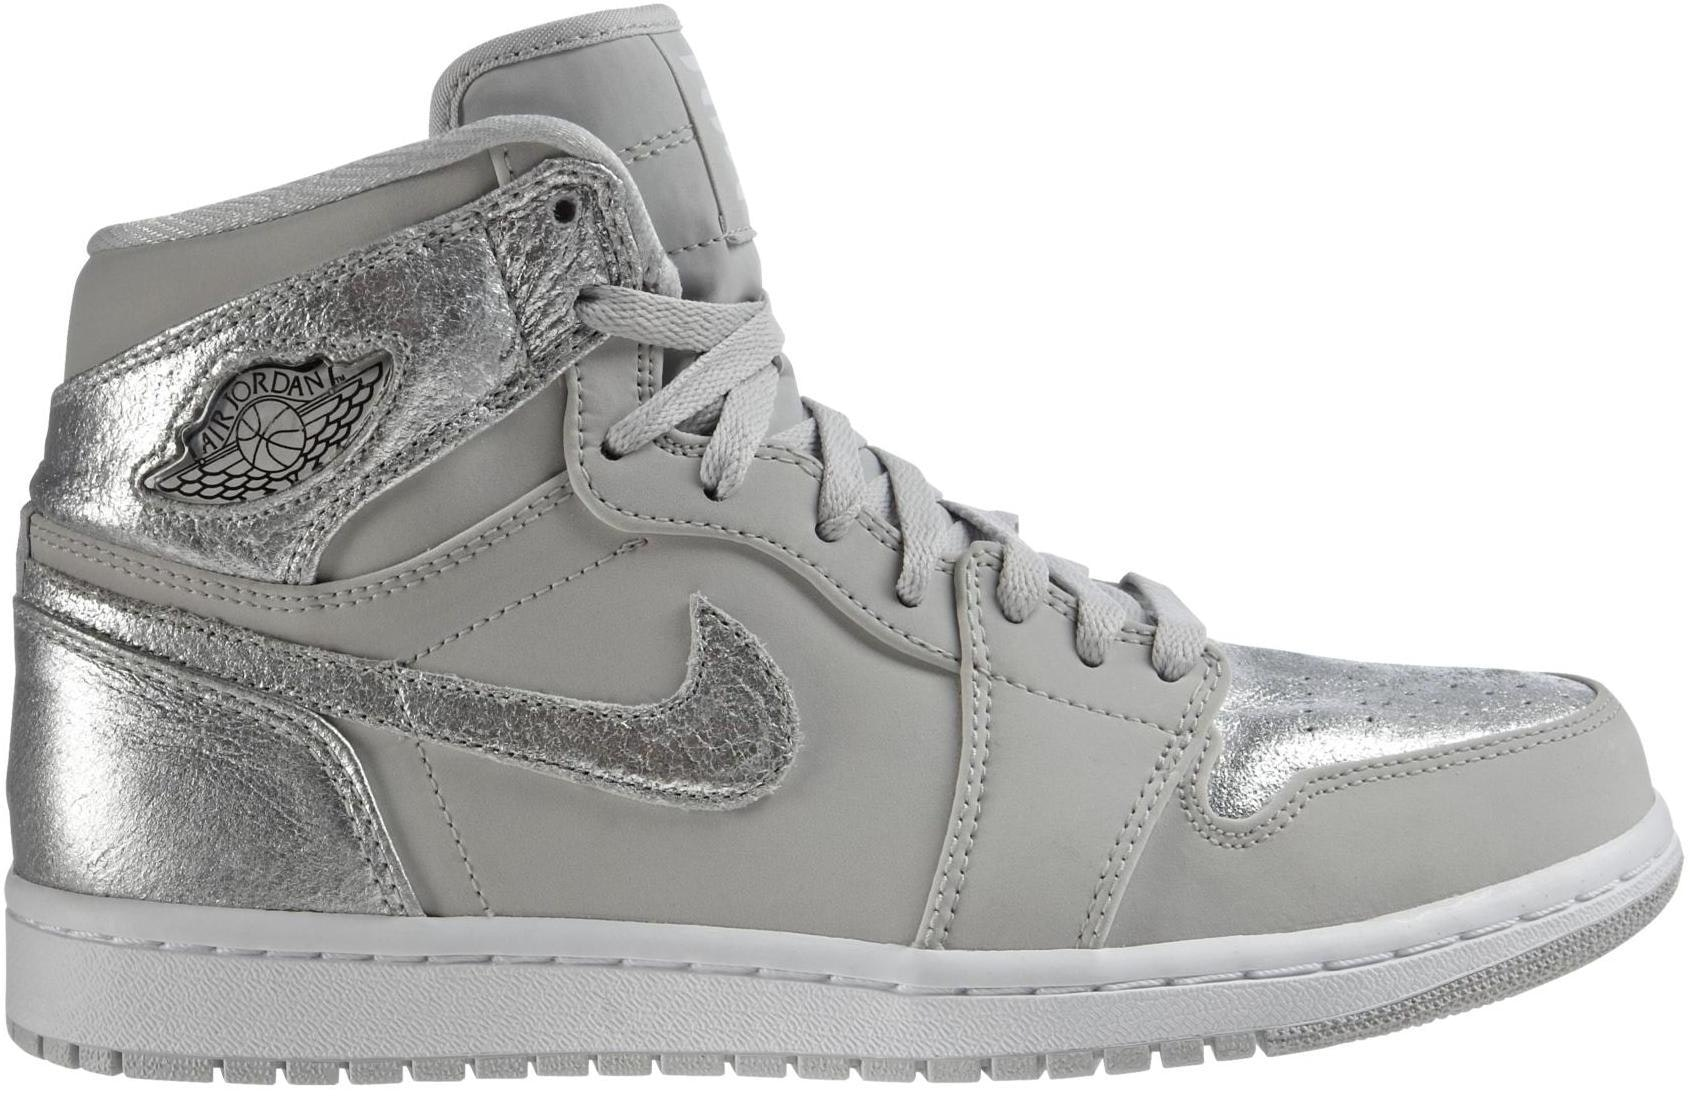 Jordan 1 Retro Silver Anniversary